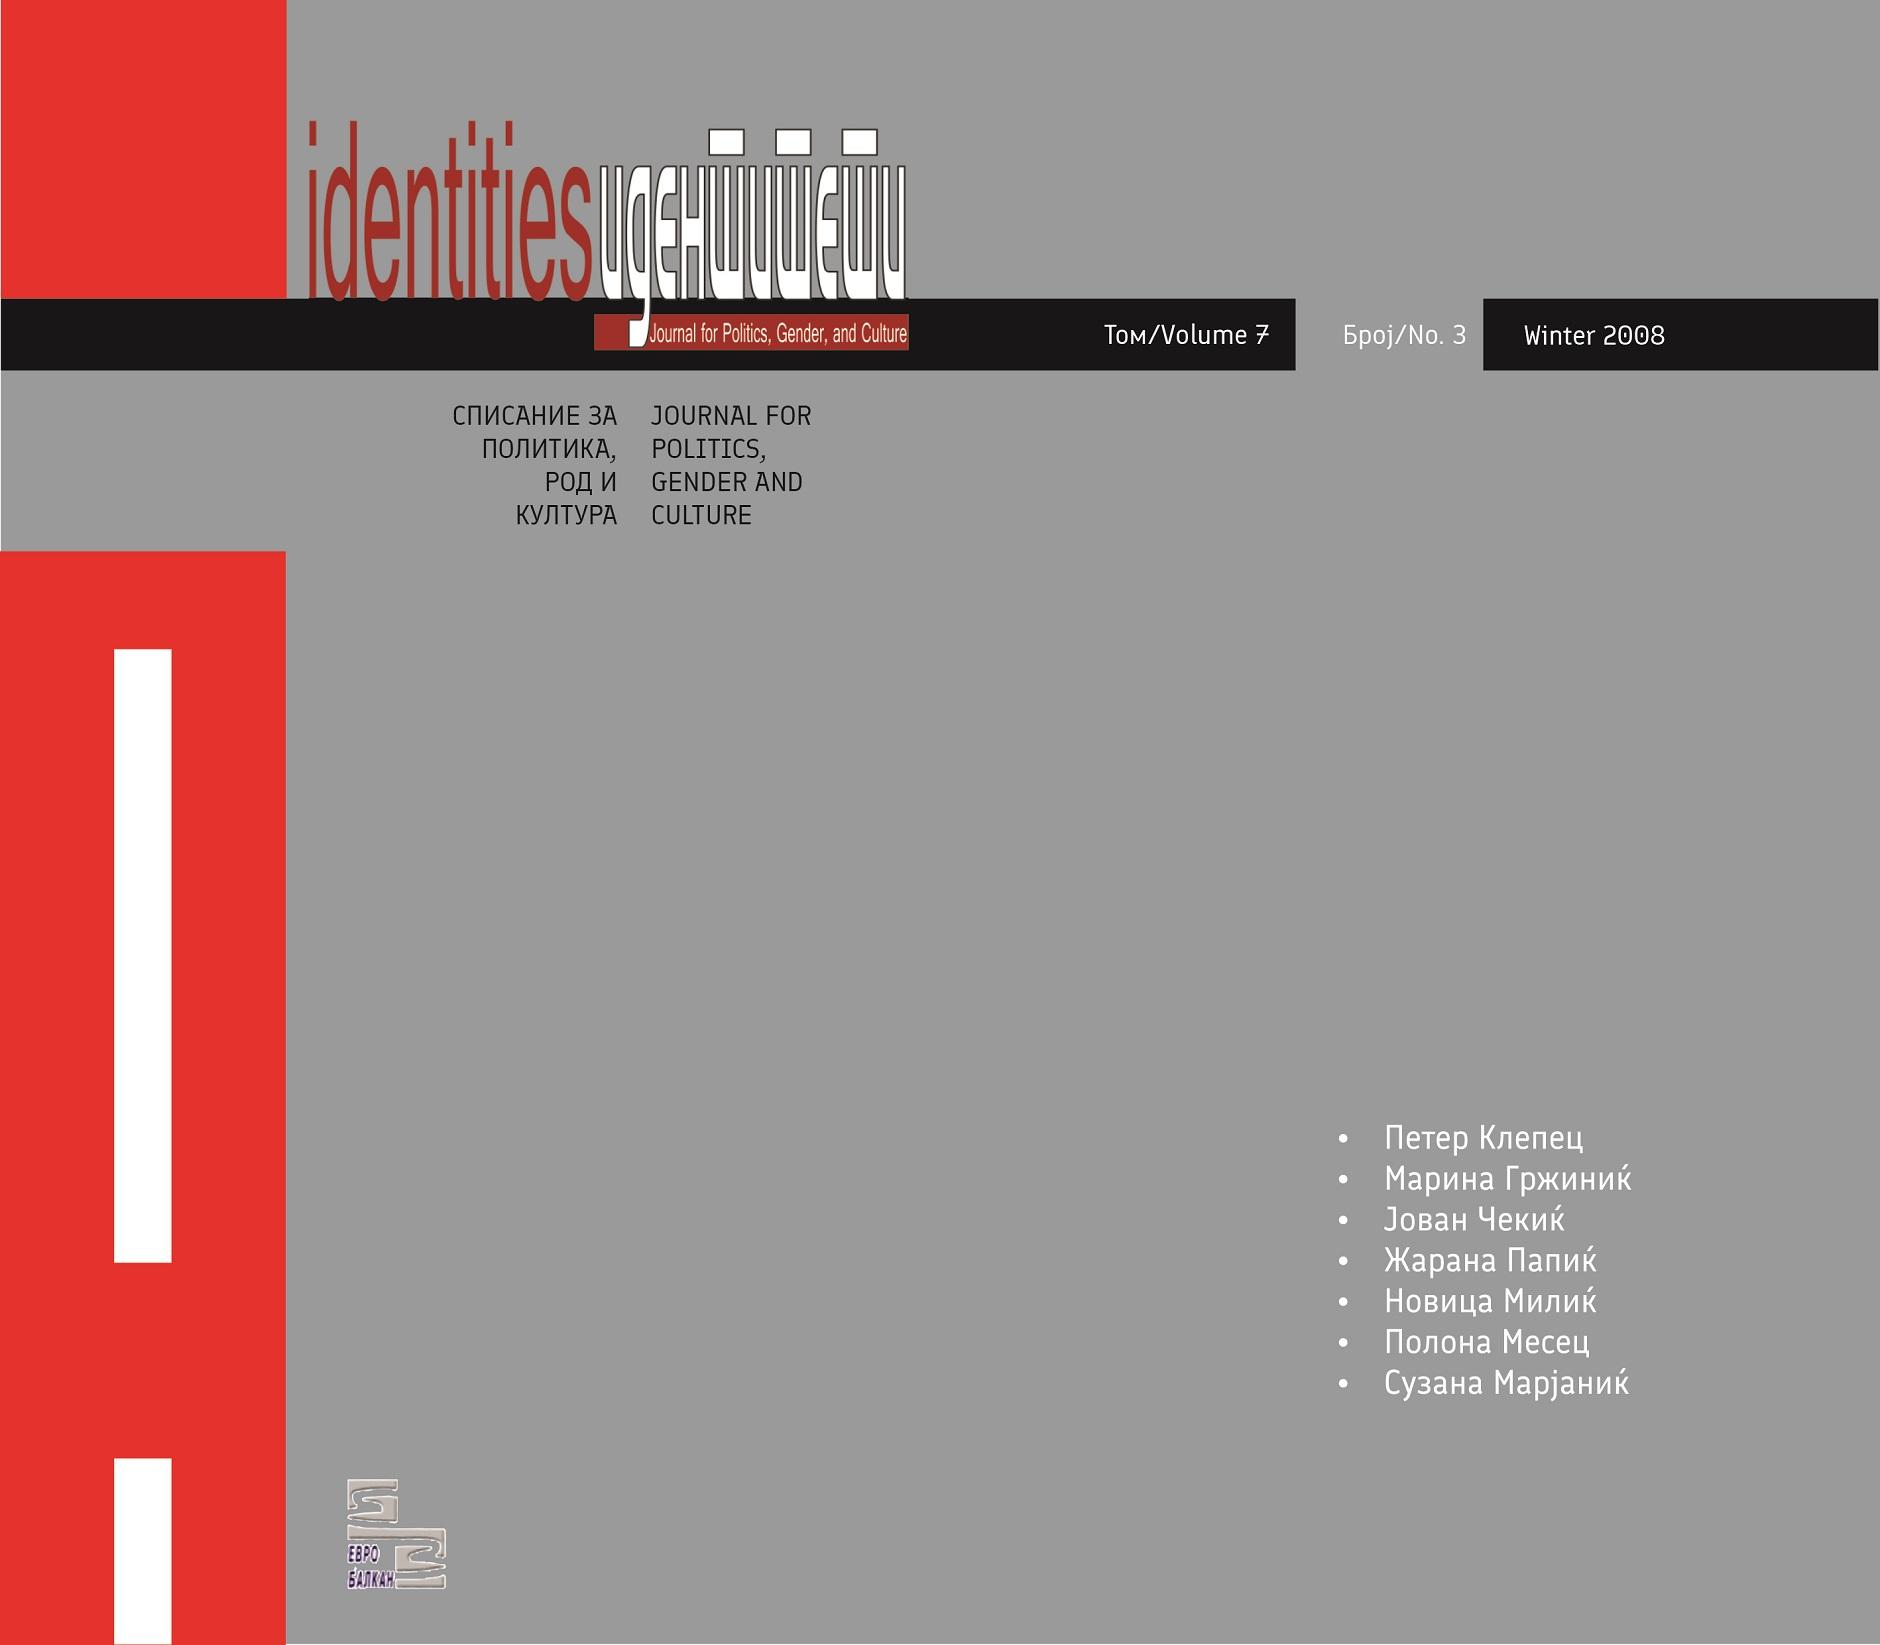 View Vol. 7 No. 3 (2008): Vol. 7, No. 3 (Winter 2008) - Issue No. 17 | Special Online Issue: East-East Translation, edited by Dušica Dimitrovska-Gajdoska